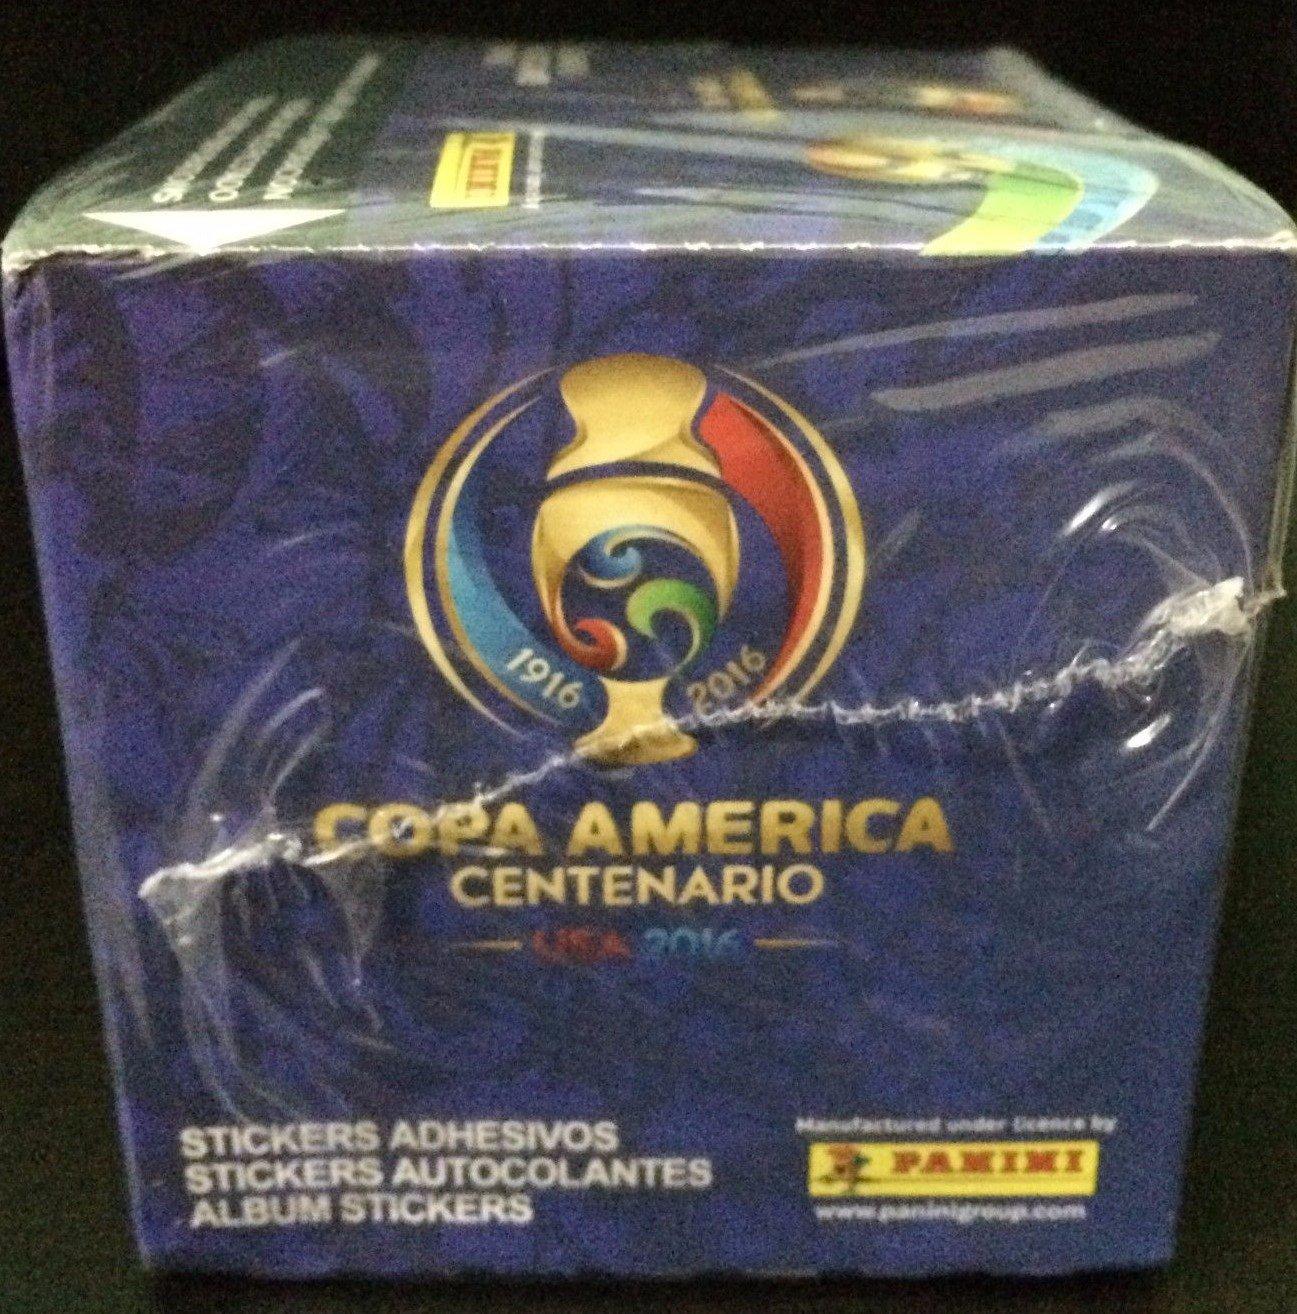 PANINI Copa America Centenario USA 2016 Stickers Box 50 Packs ; 5 stickers per pack total of 250 stickers